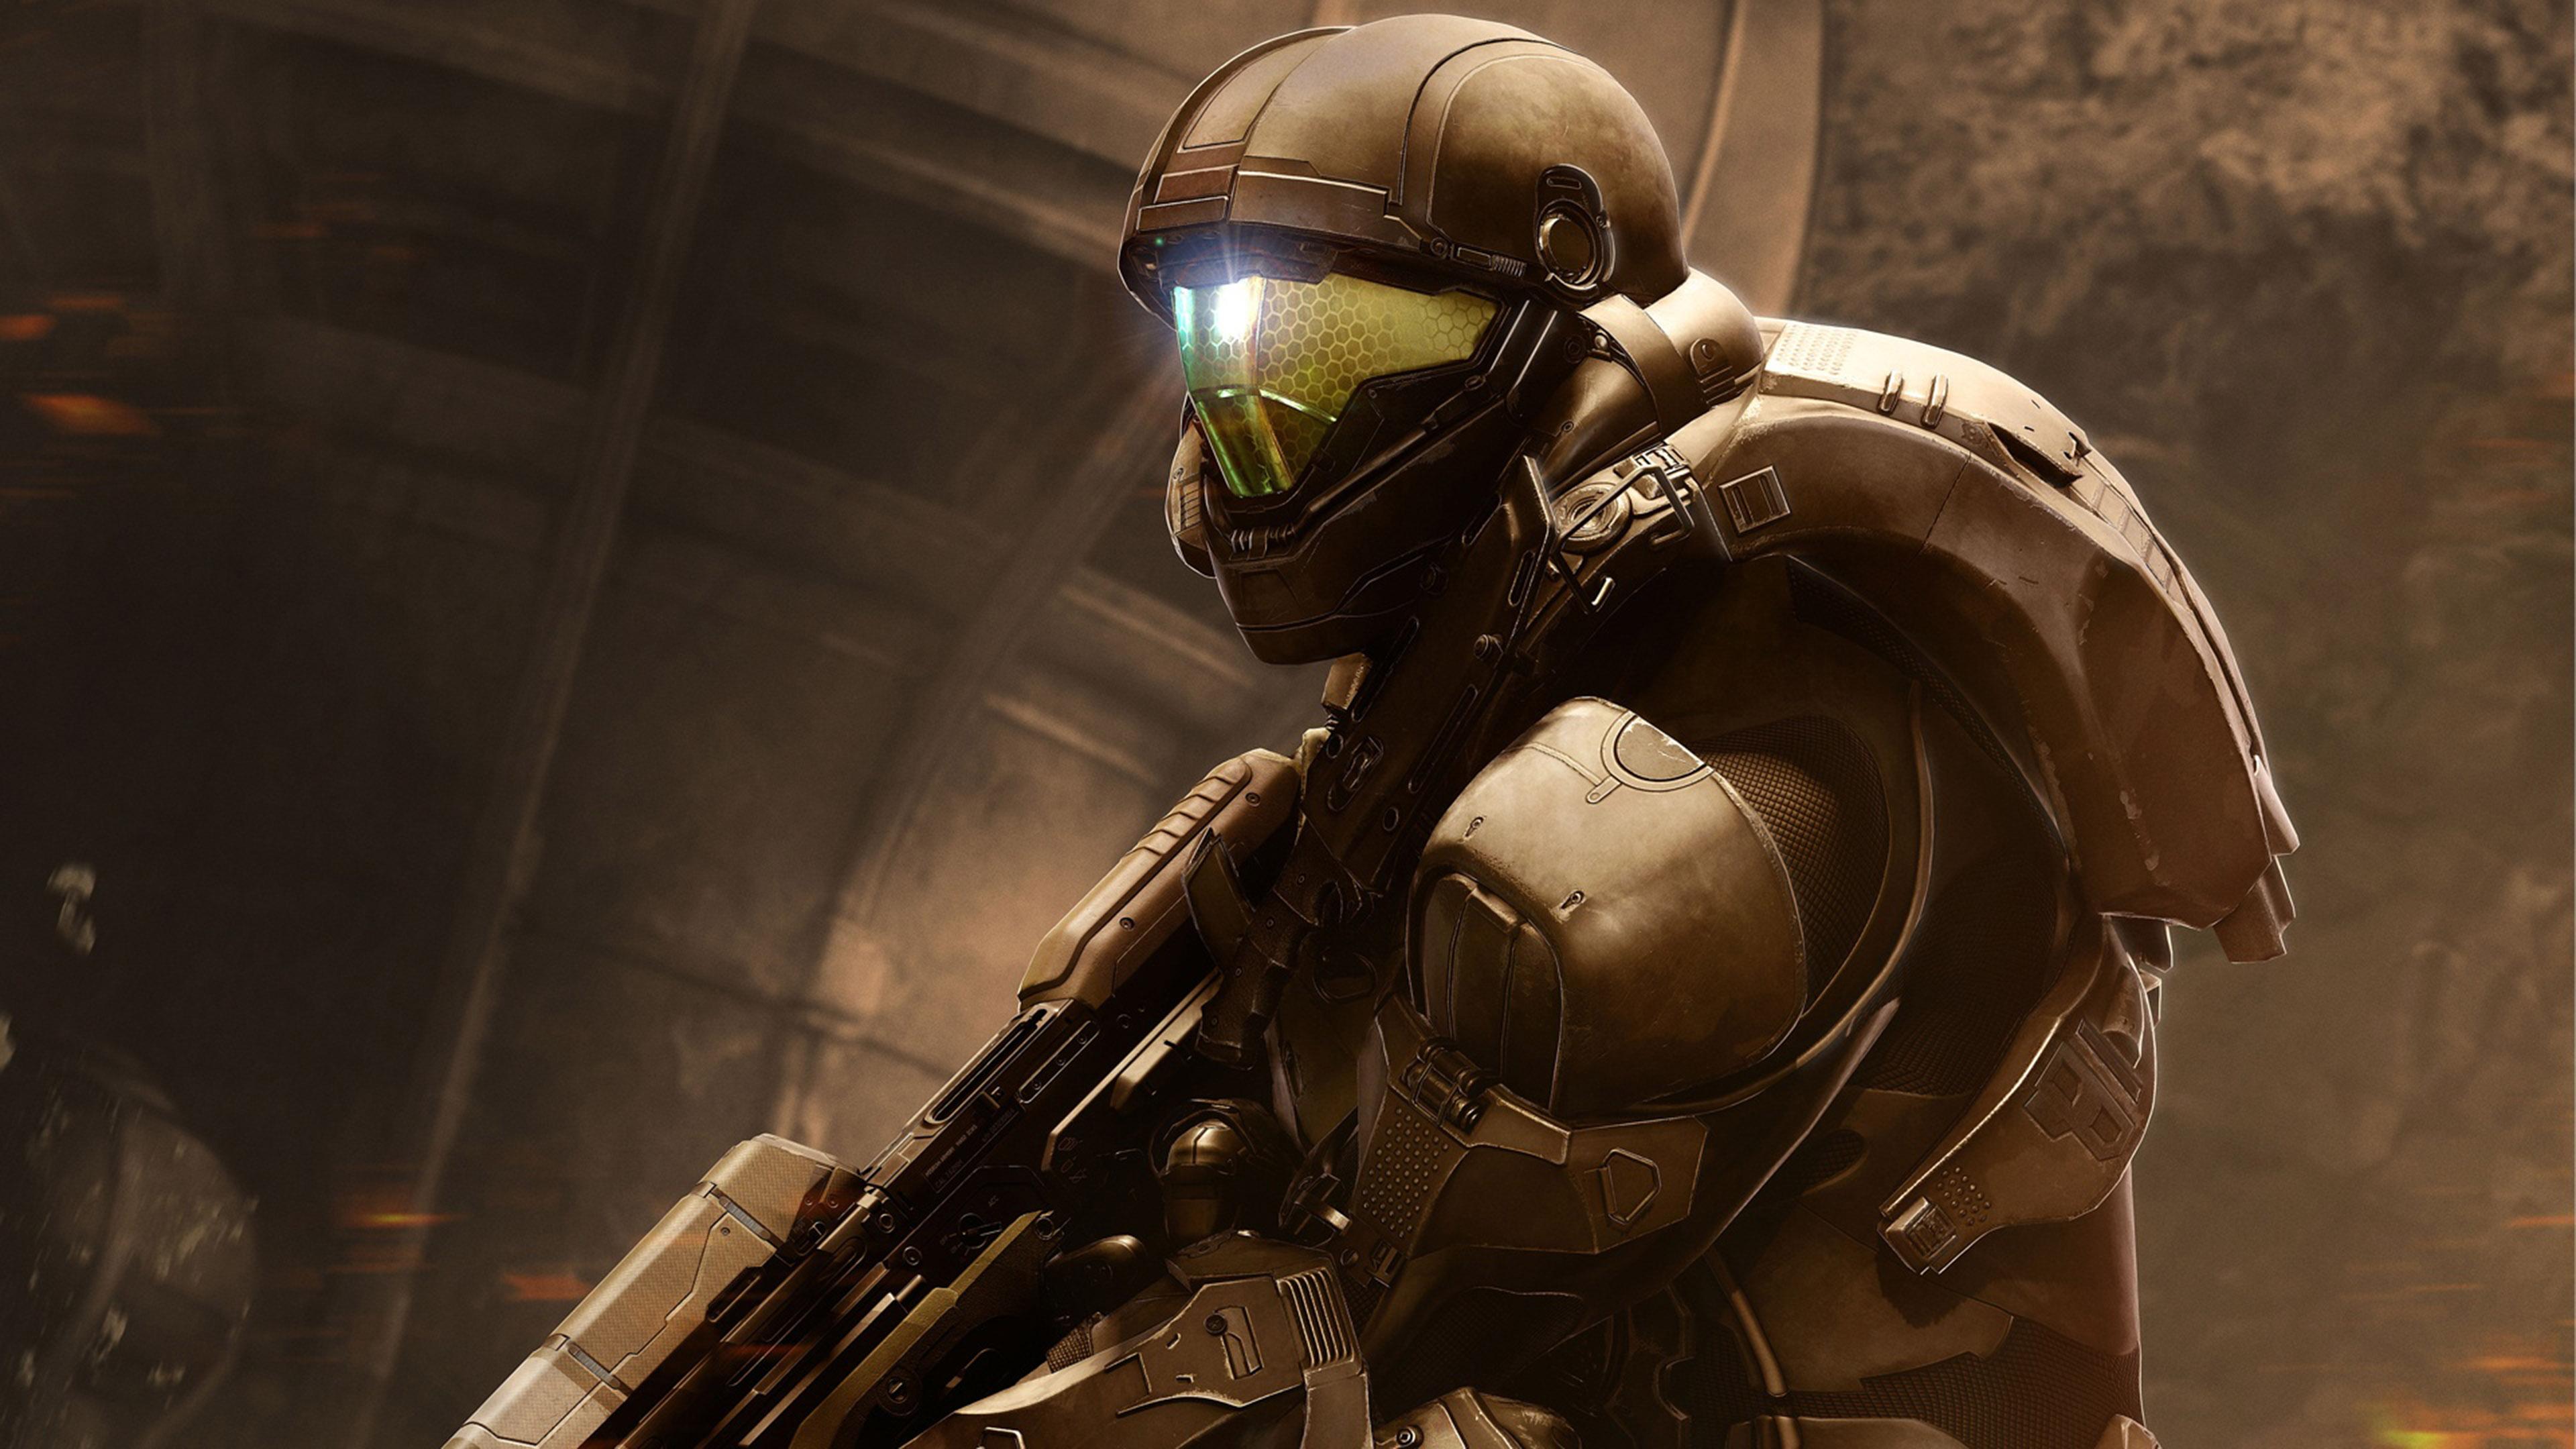 HD Background Halo 5 Guardians Game Buck Shooter Robot Wallpaper 3840x2160